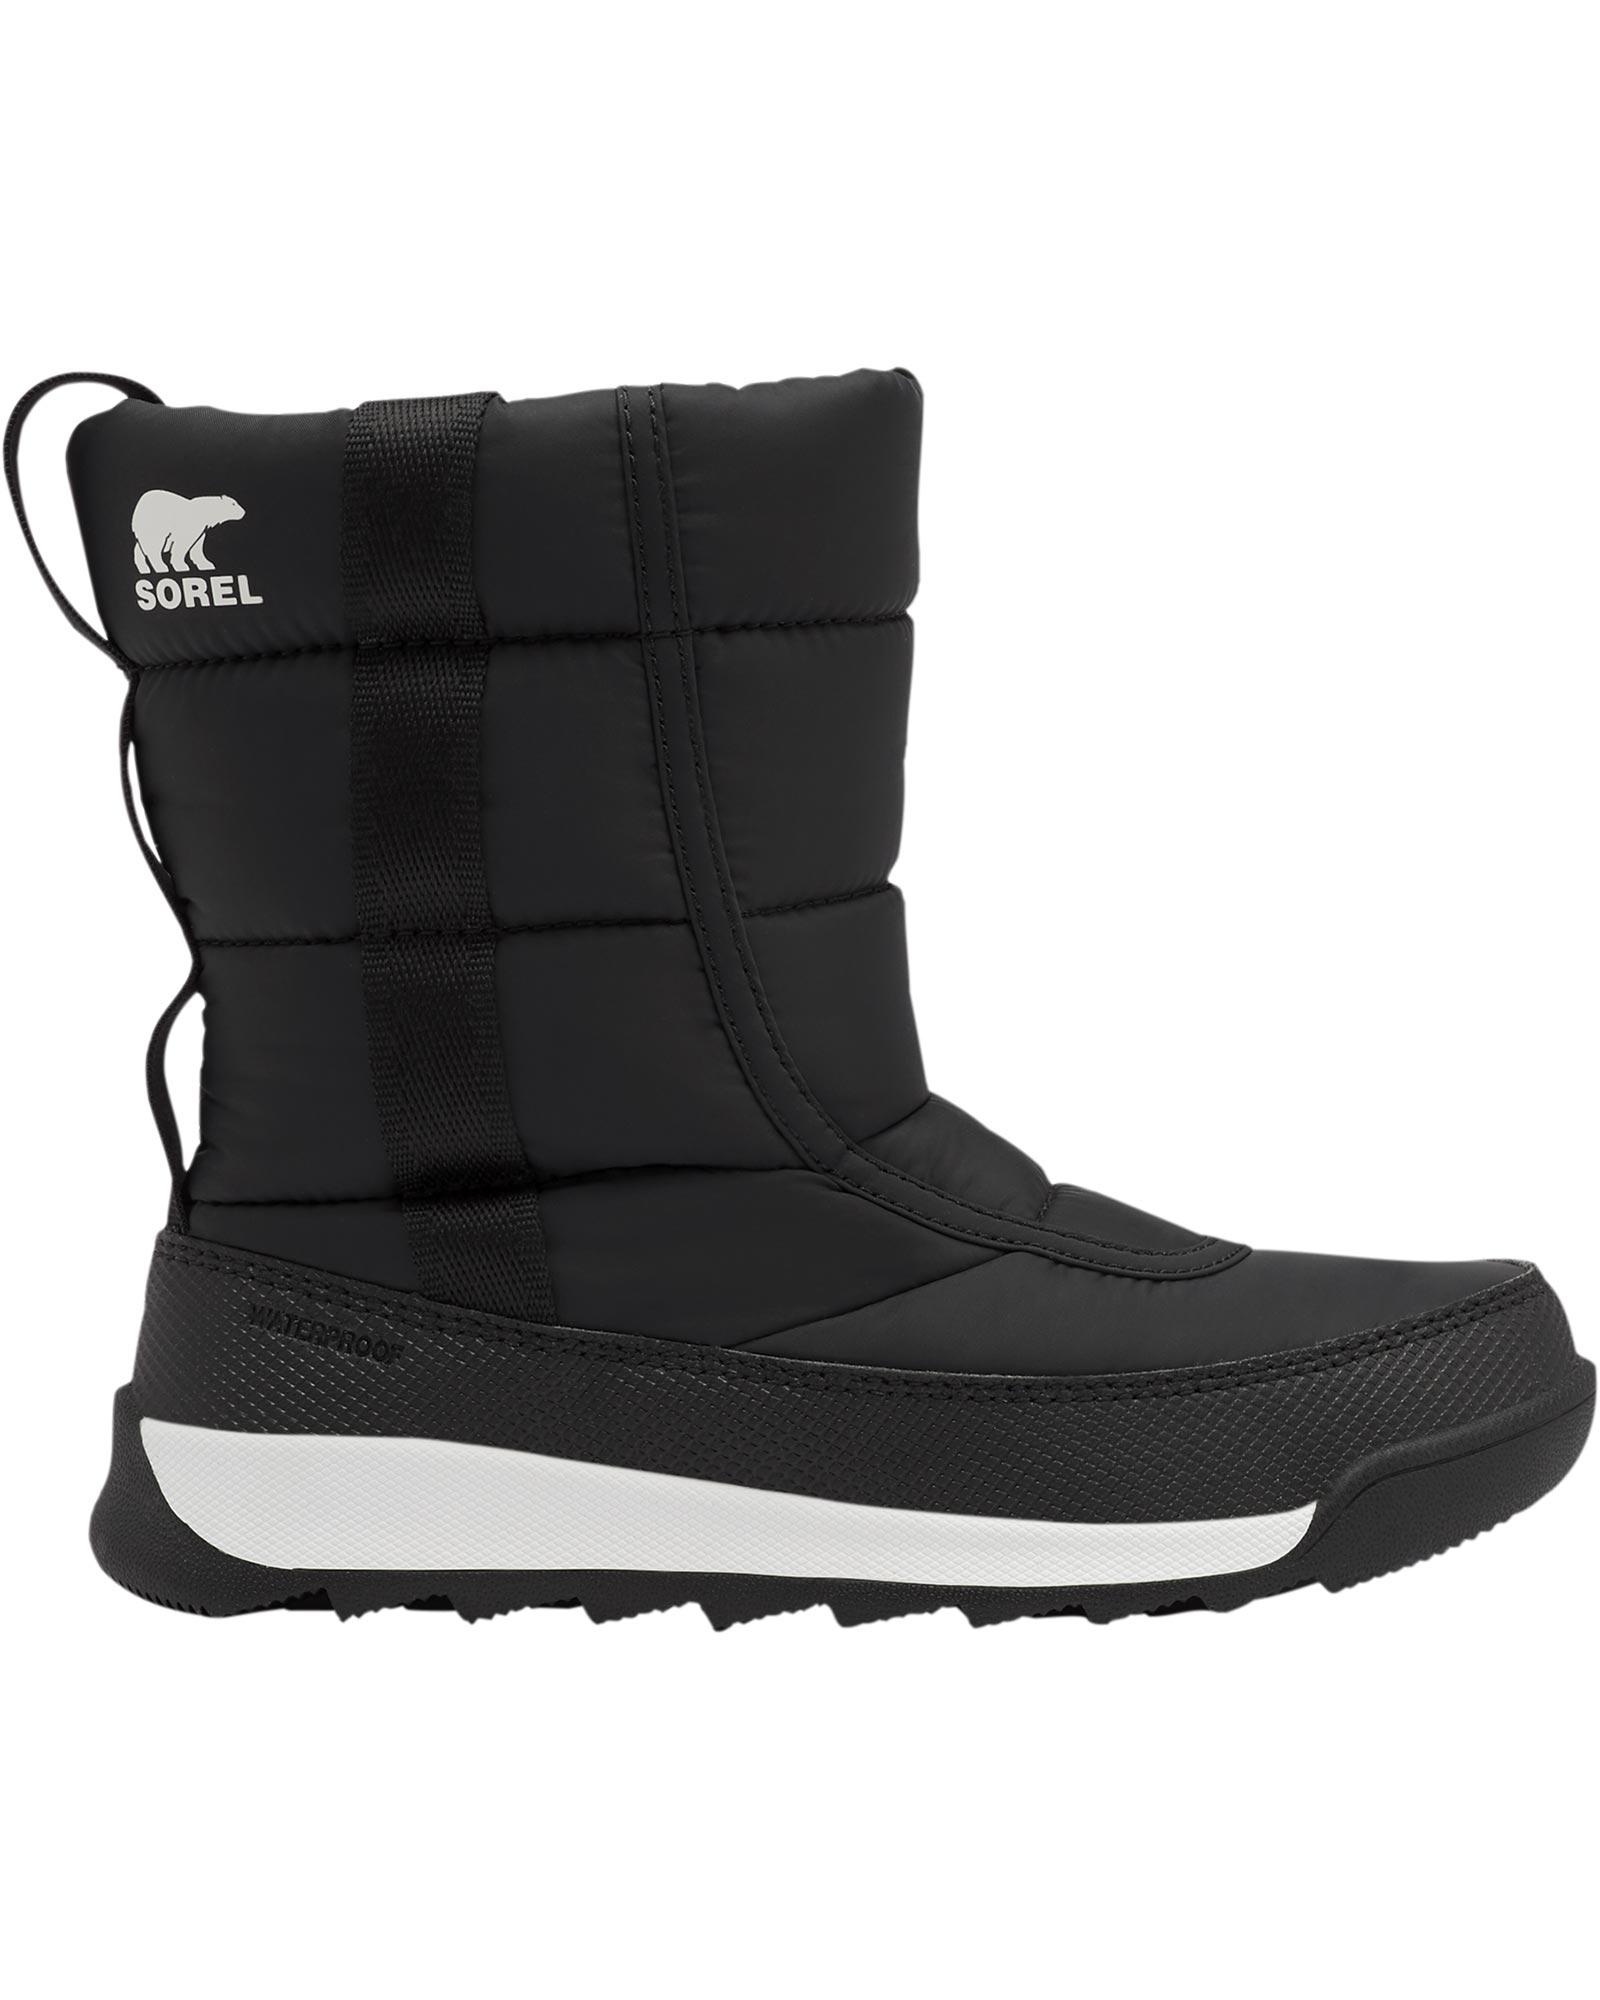 Sorel Womens Cozy Joan Snow Boots